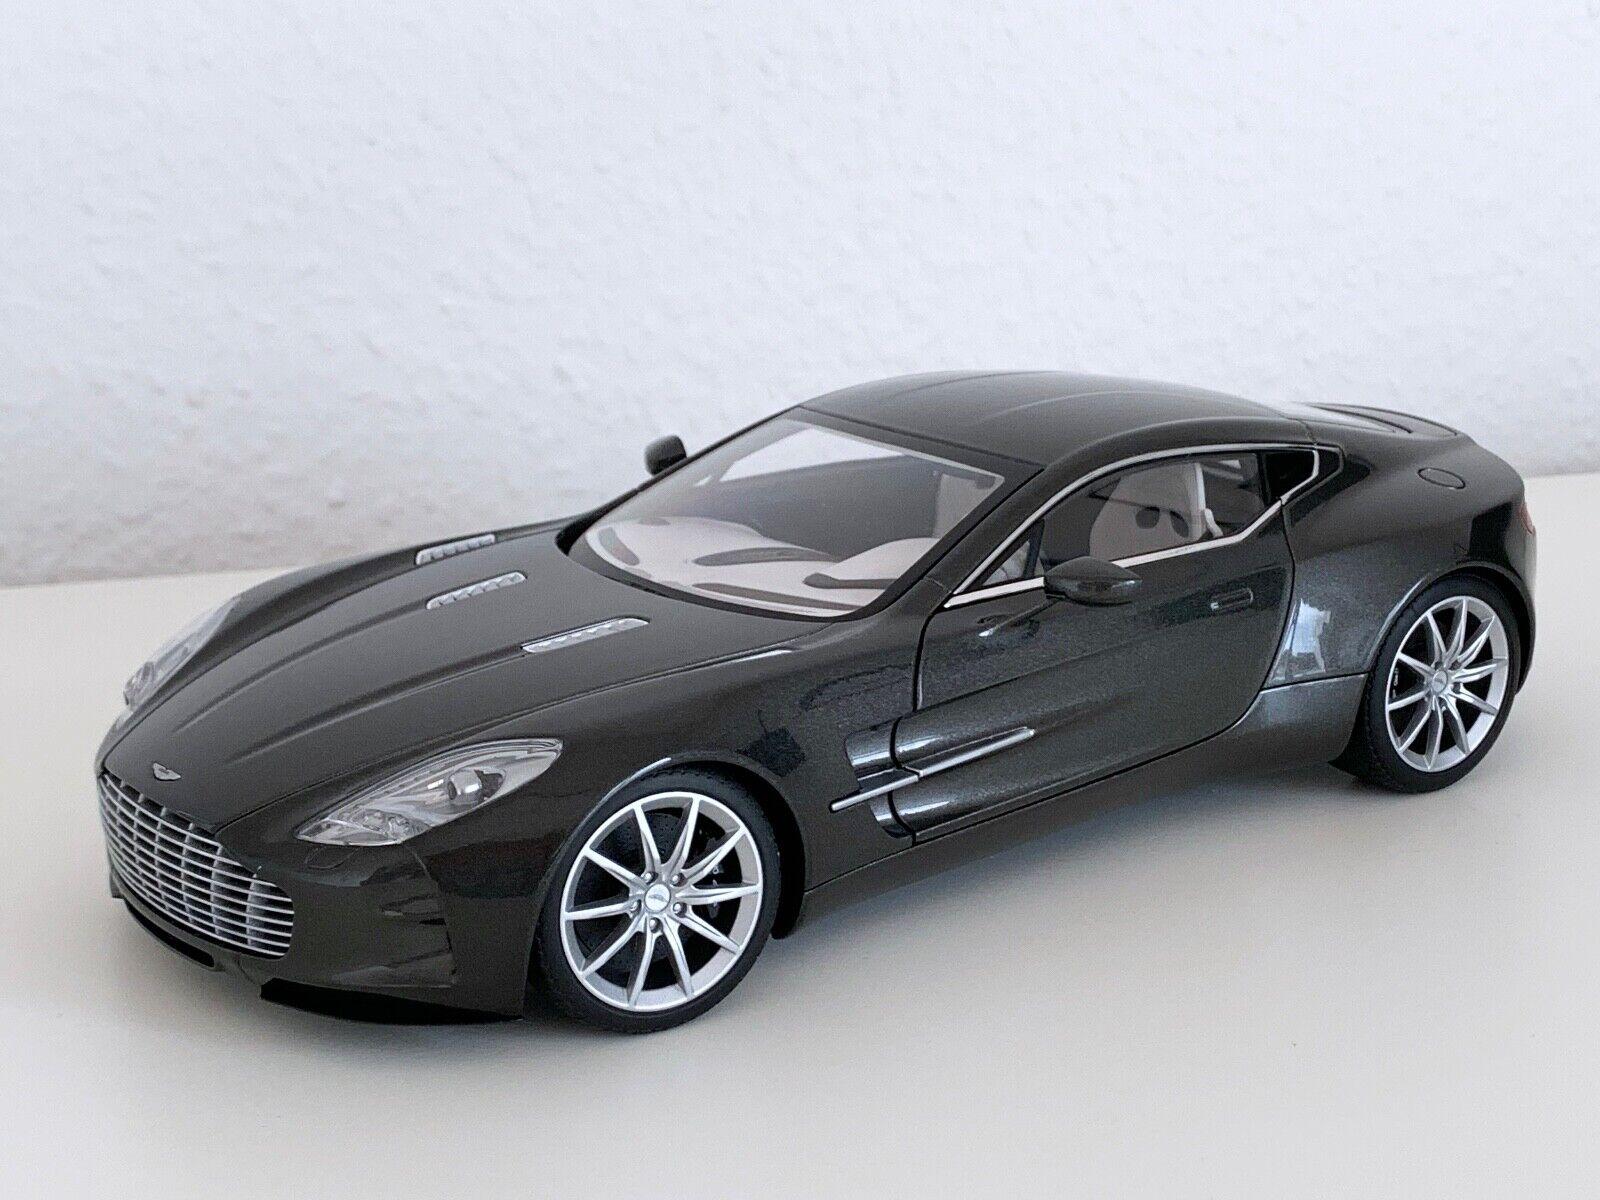 Autoart 70242 1 18 Aston Martin One-77 (Spirit grau) OVP